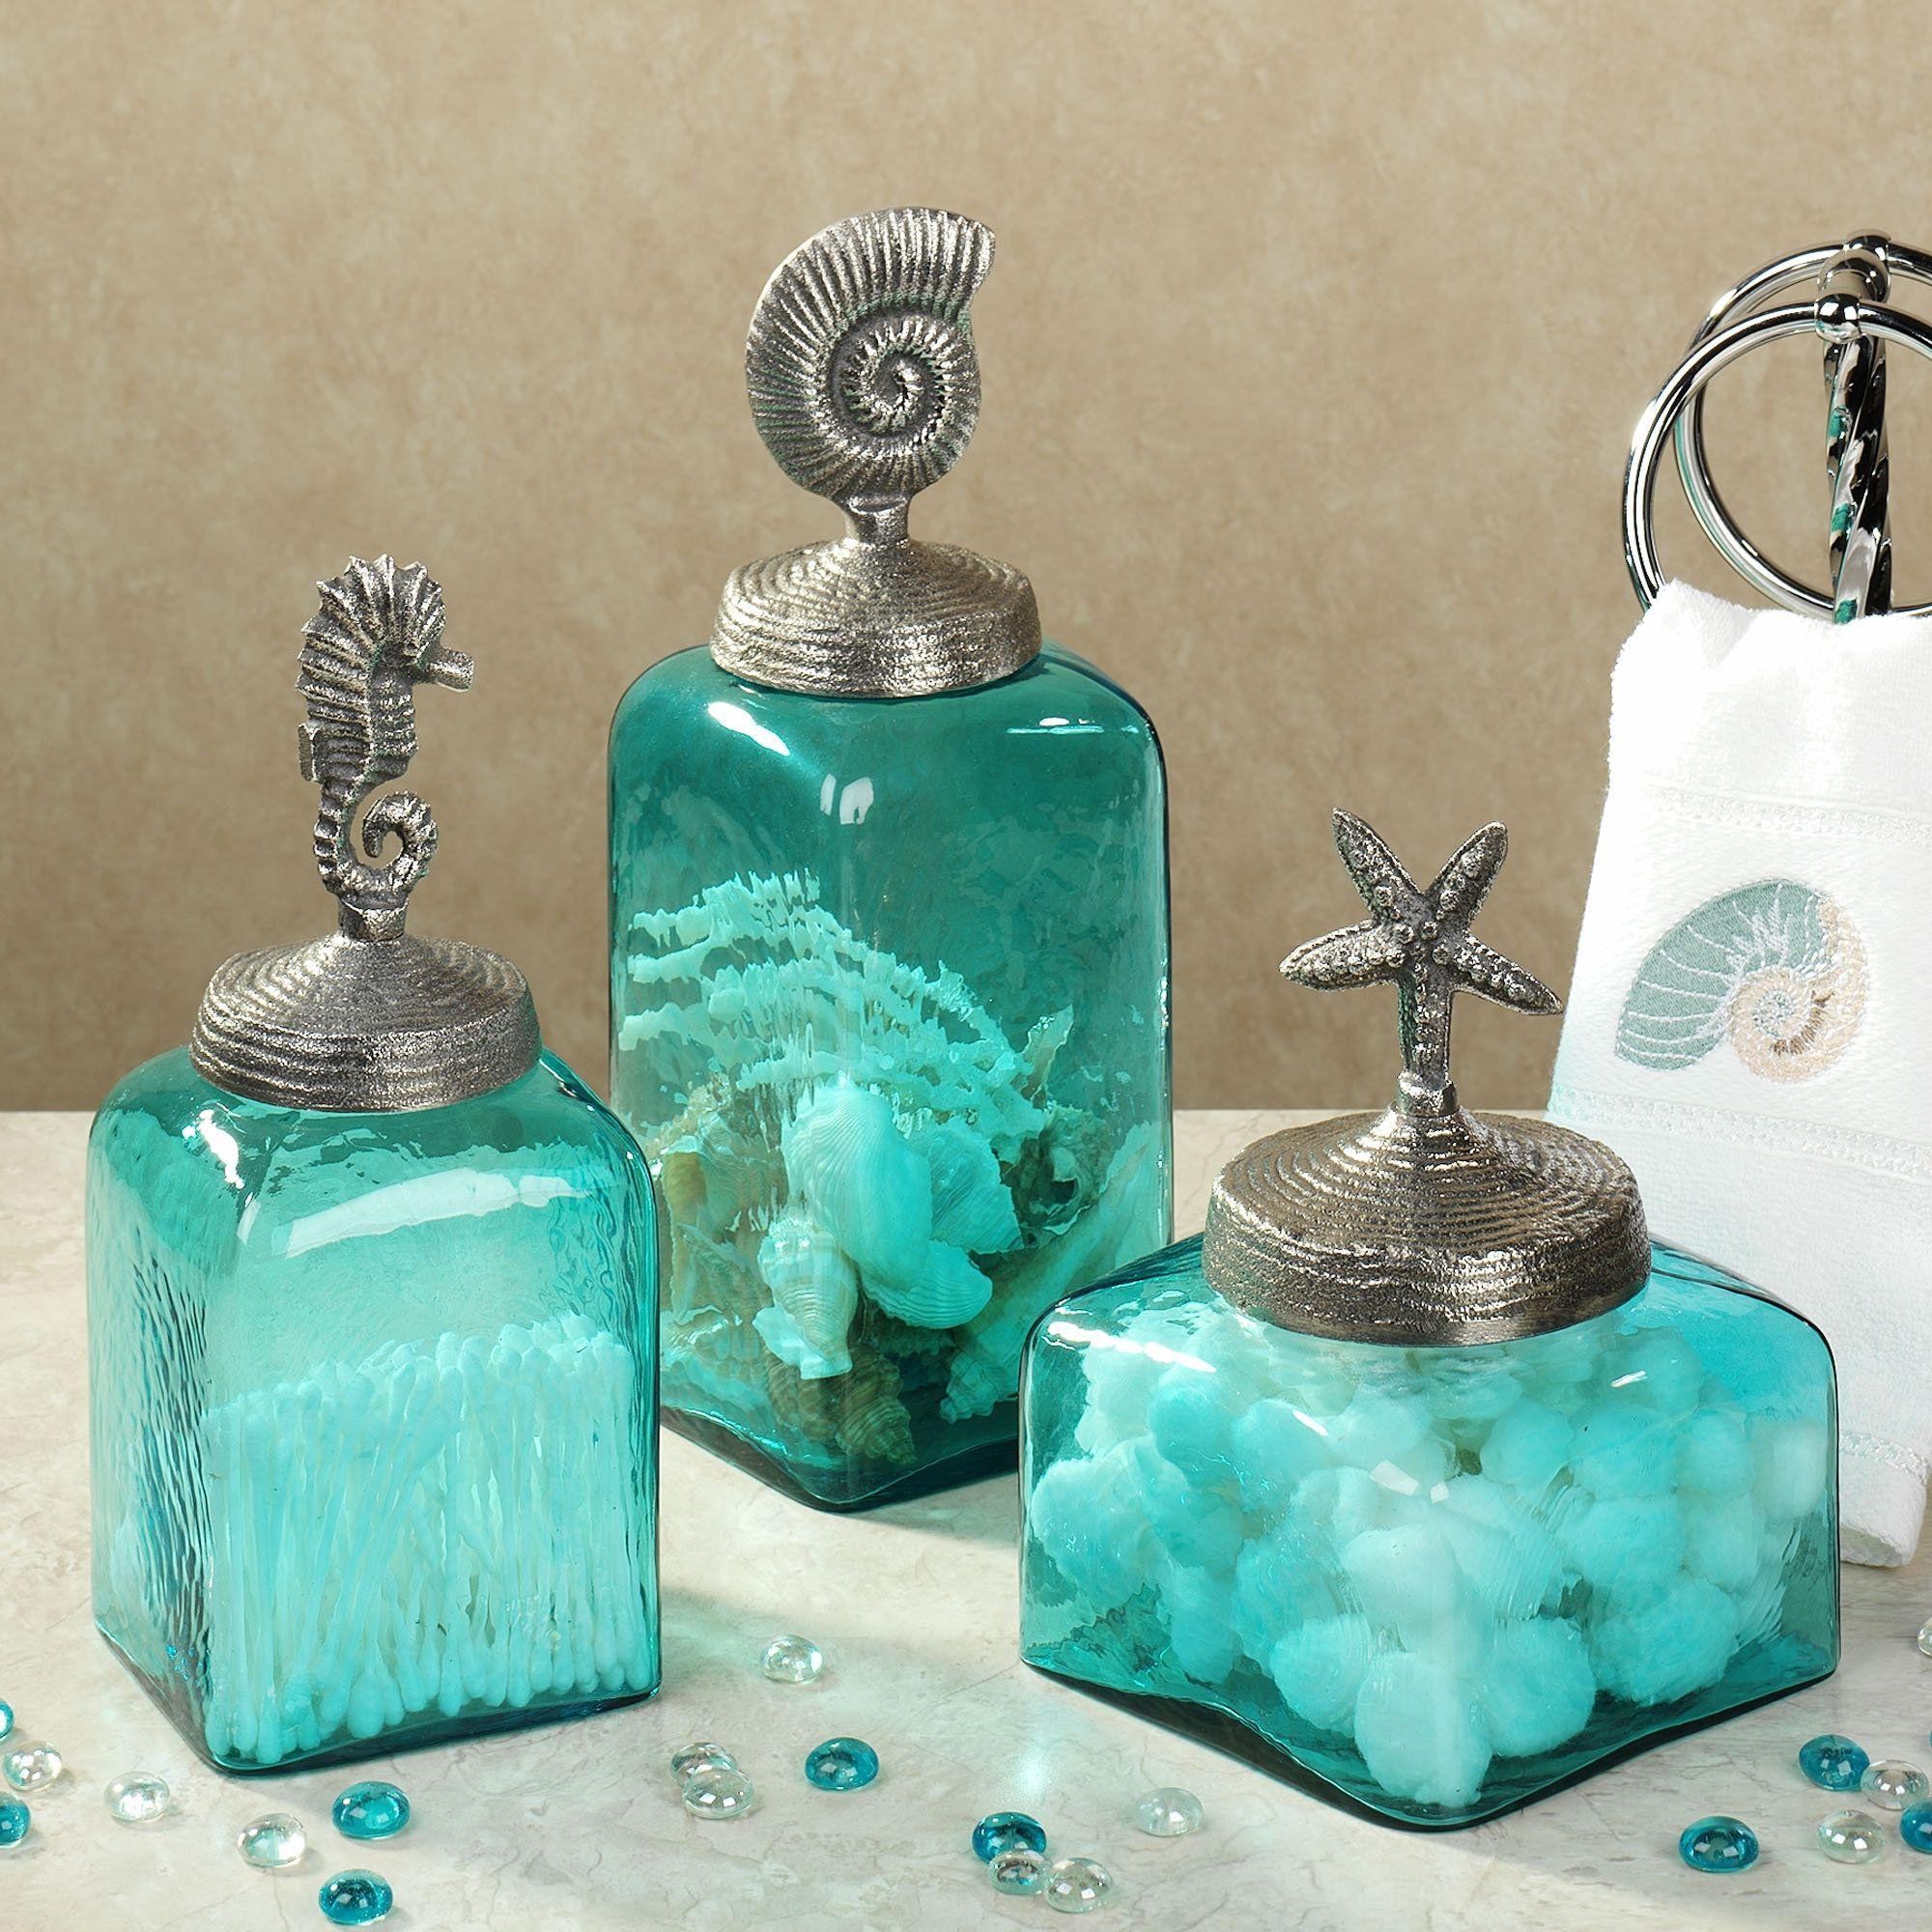 Turquoise Bathroom Accessories - Frasesdeconquista.com